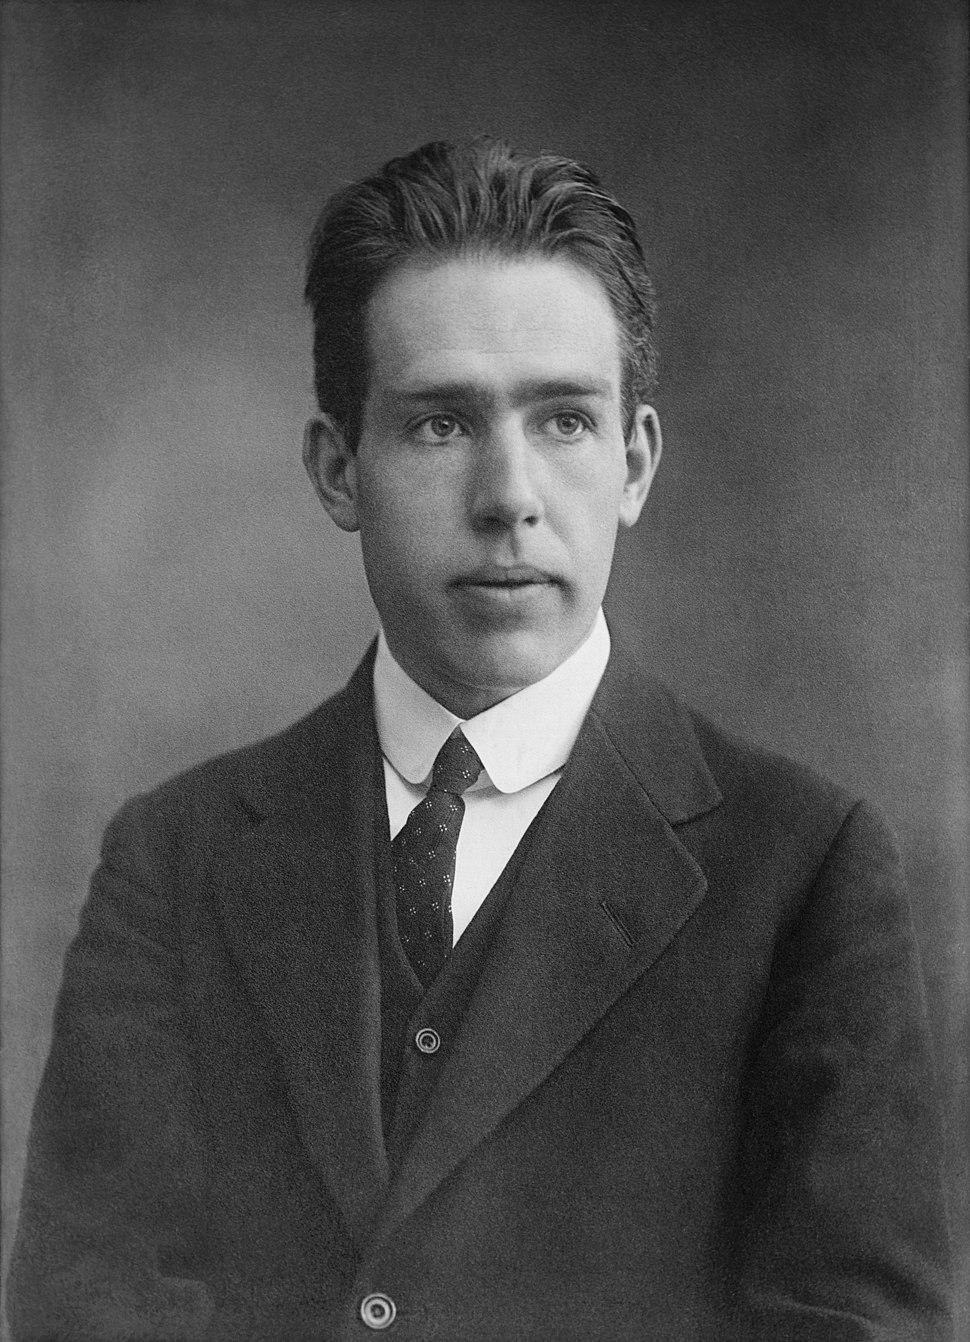 Niels Bohr - LOC - ggbain - 35303